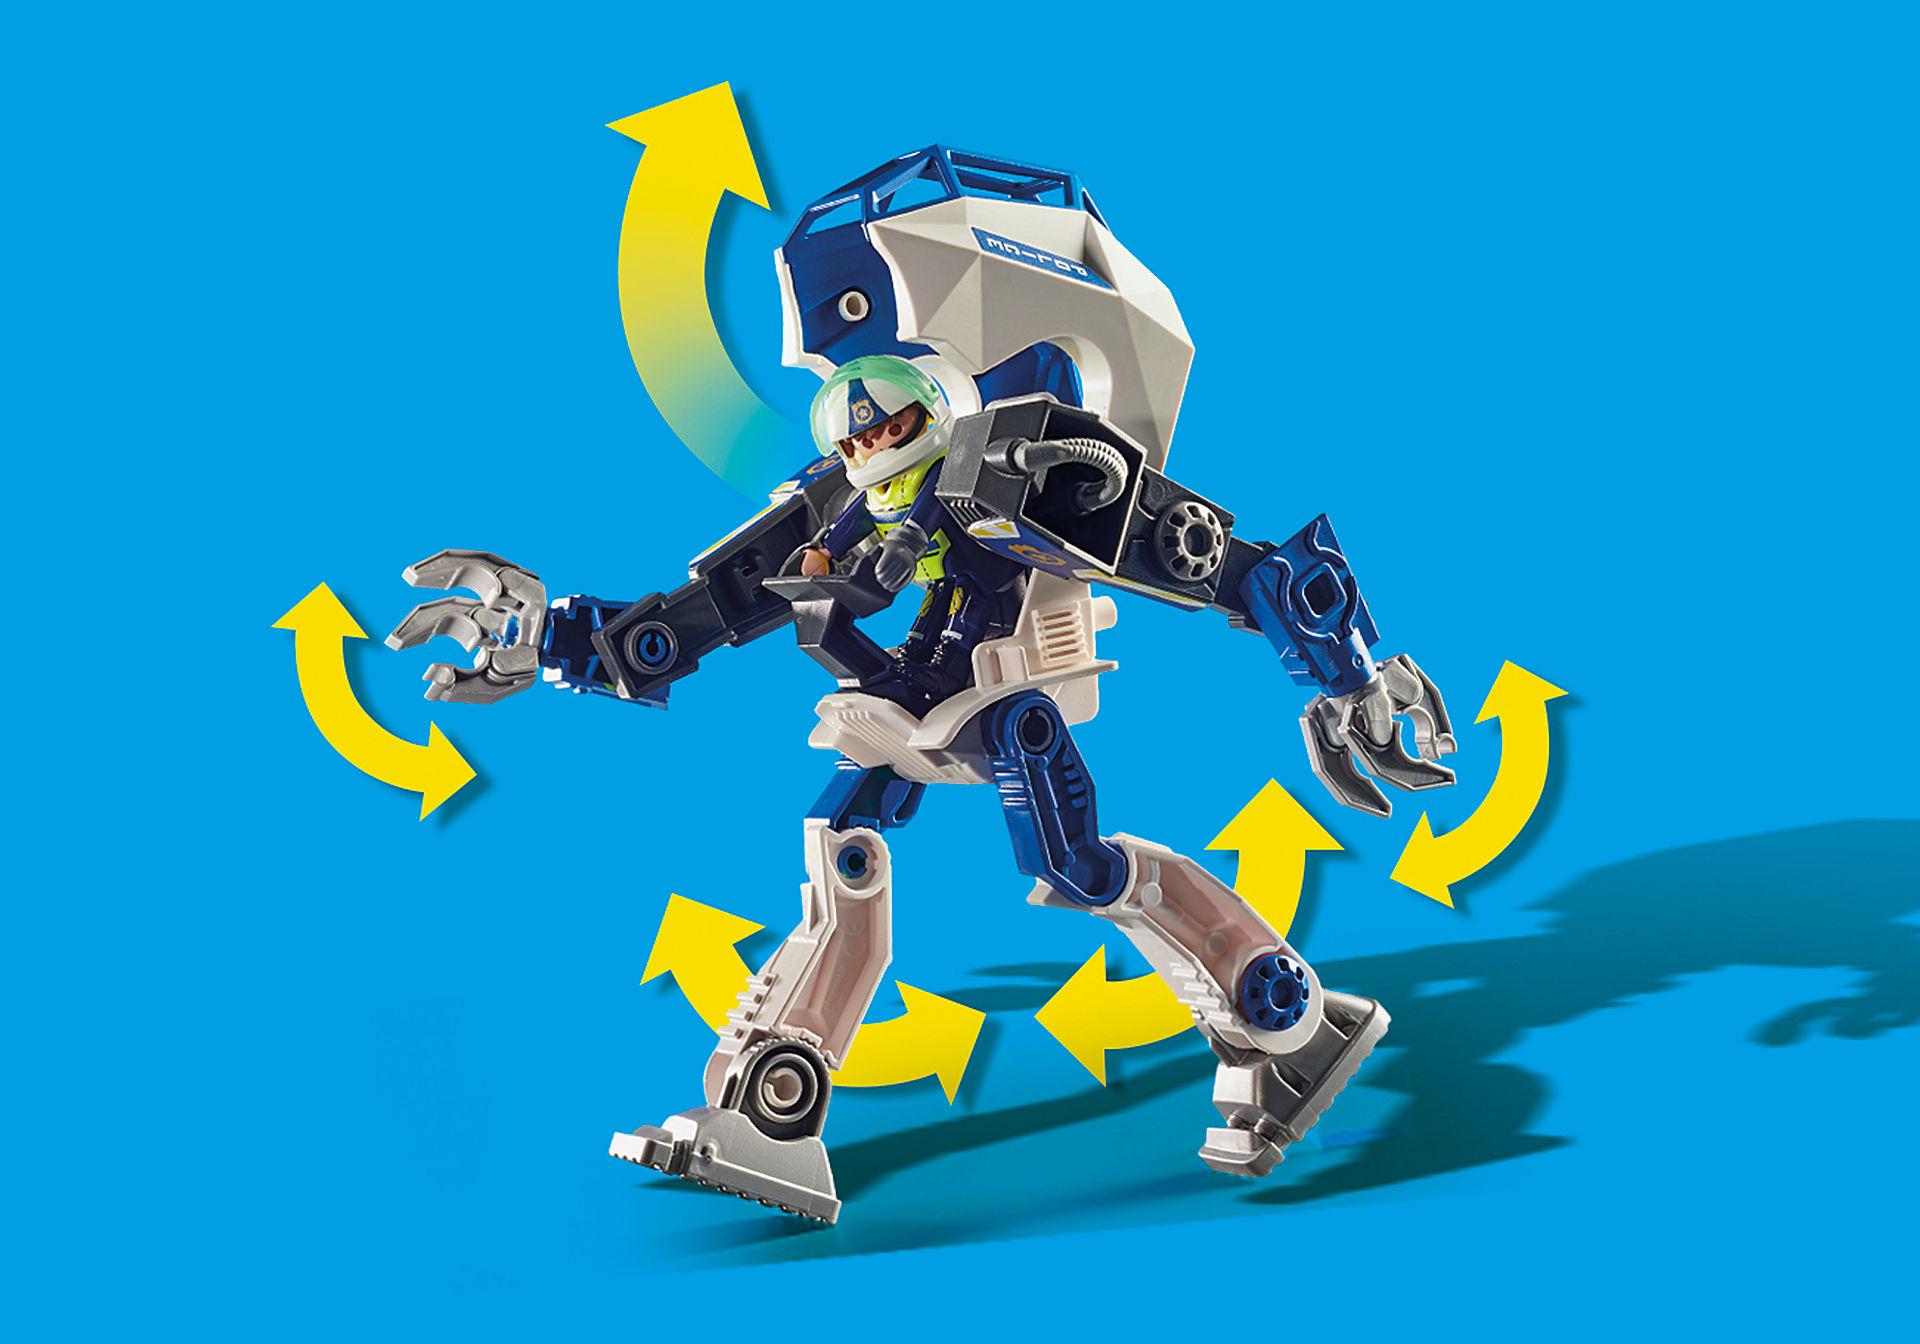 70571 Polisrobot: Specialstyrka  zoom image7